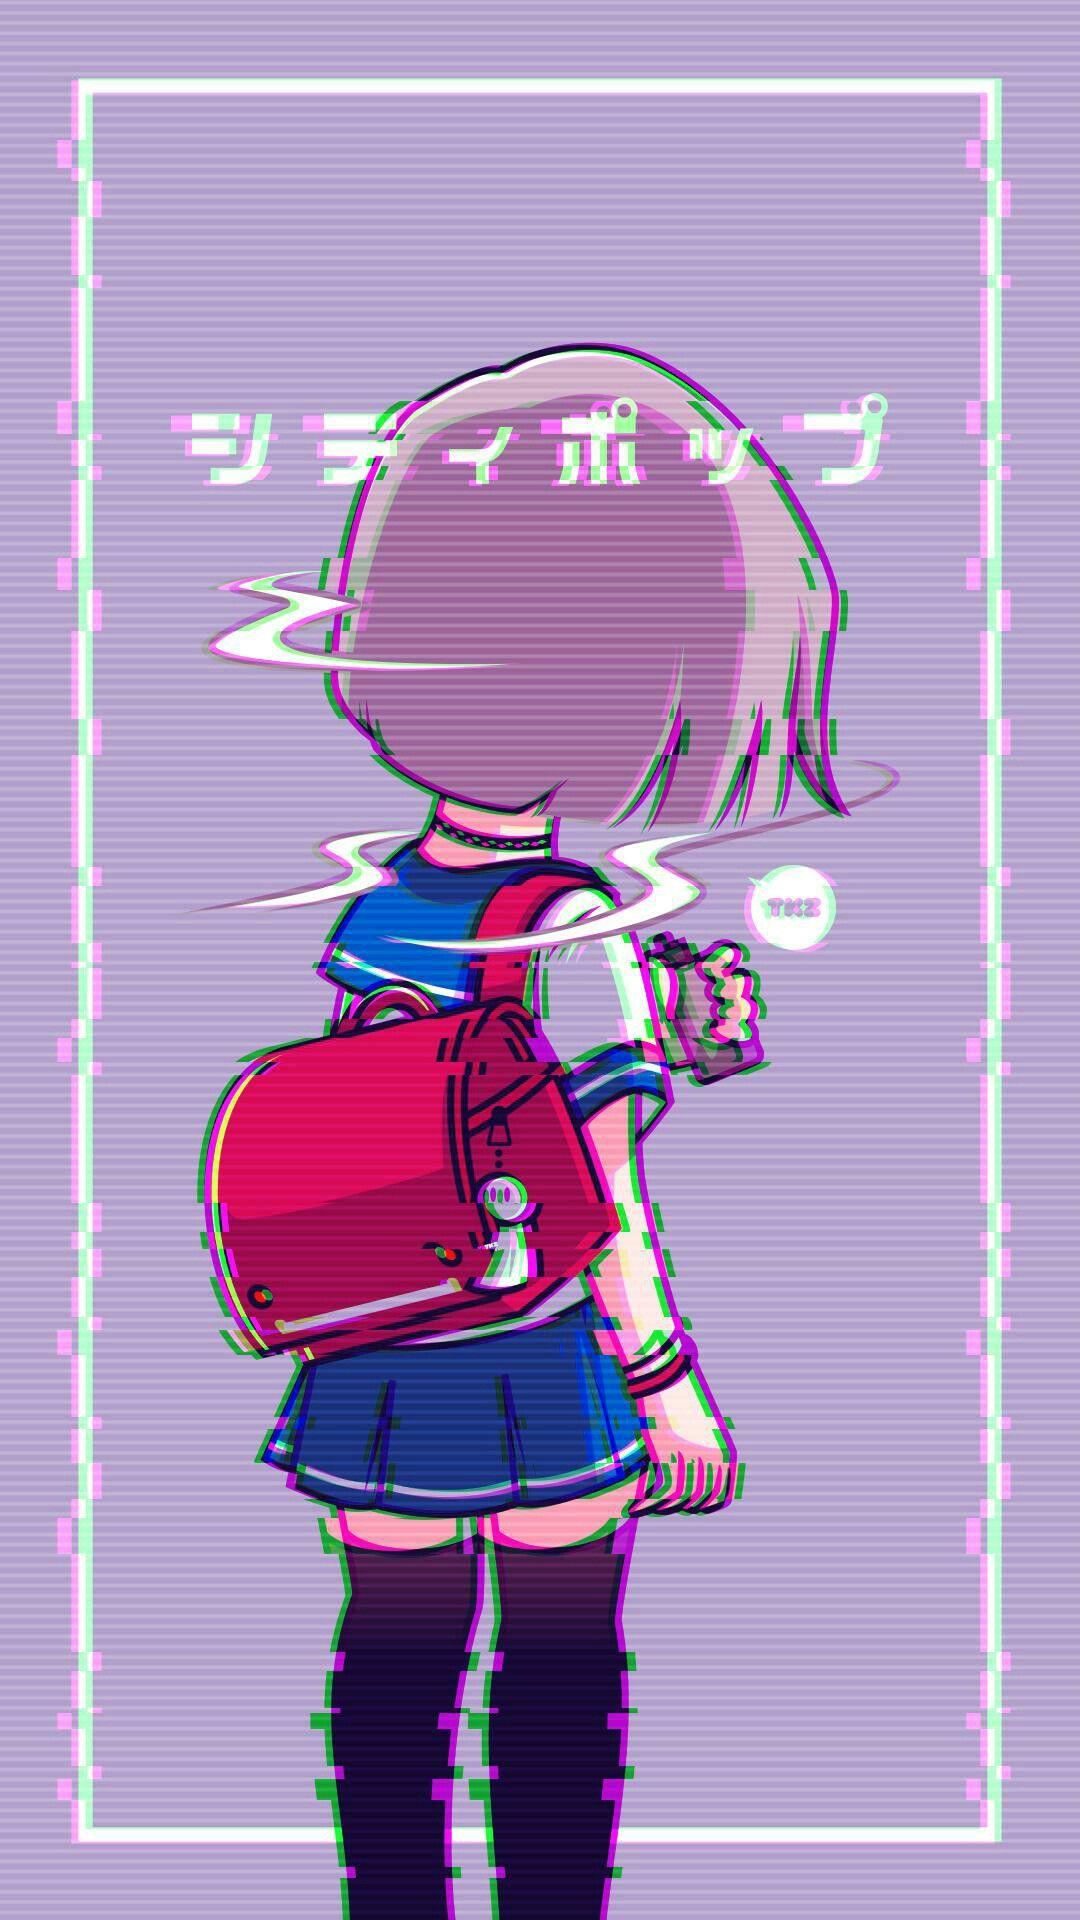 Sakura Sayuri Hehehe Aesthetic Iphone Wallpaper Iphone Wallpaper Tumblr Aesthetic Aesthetic Anime